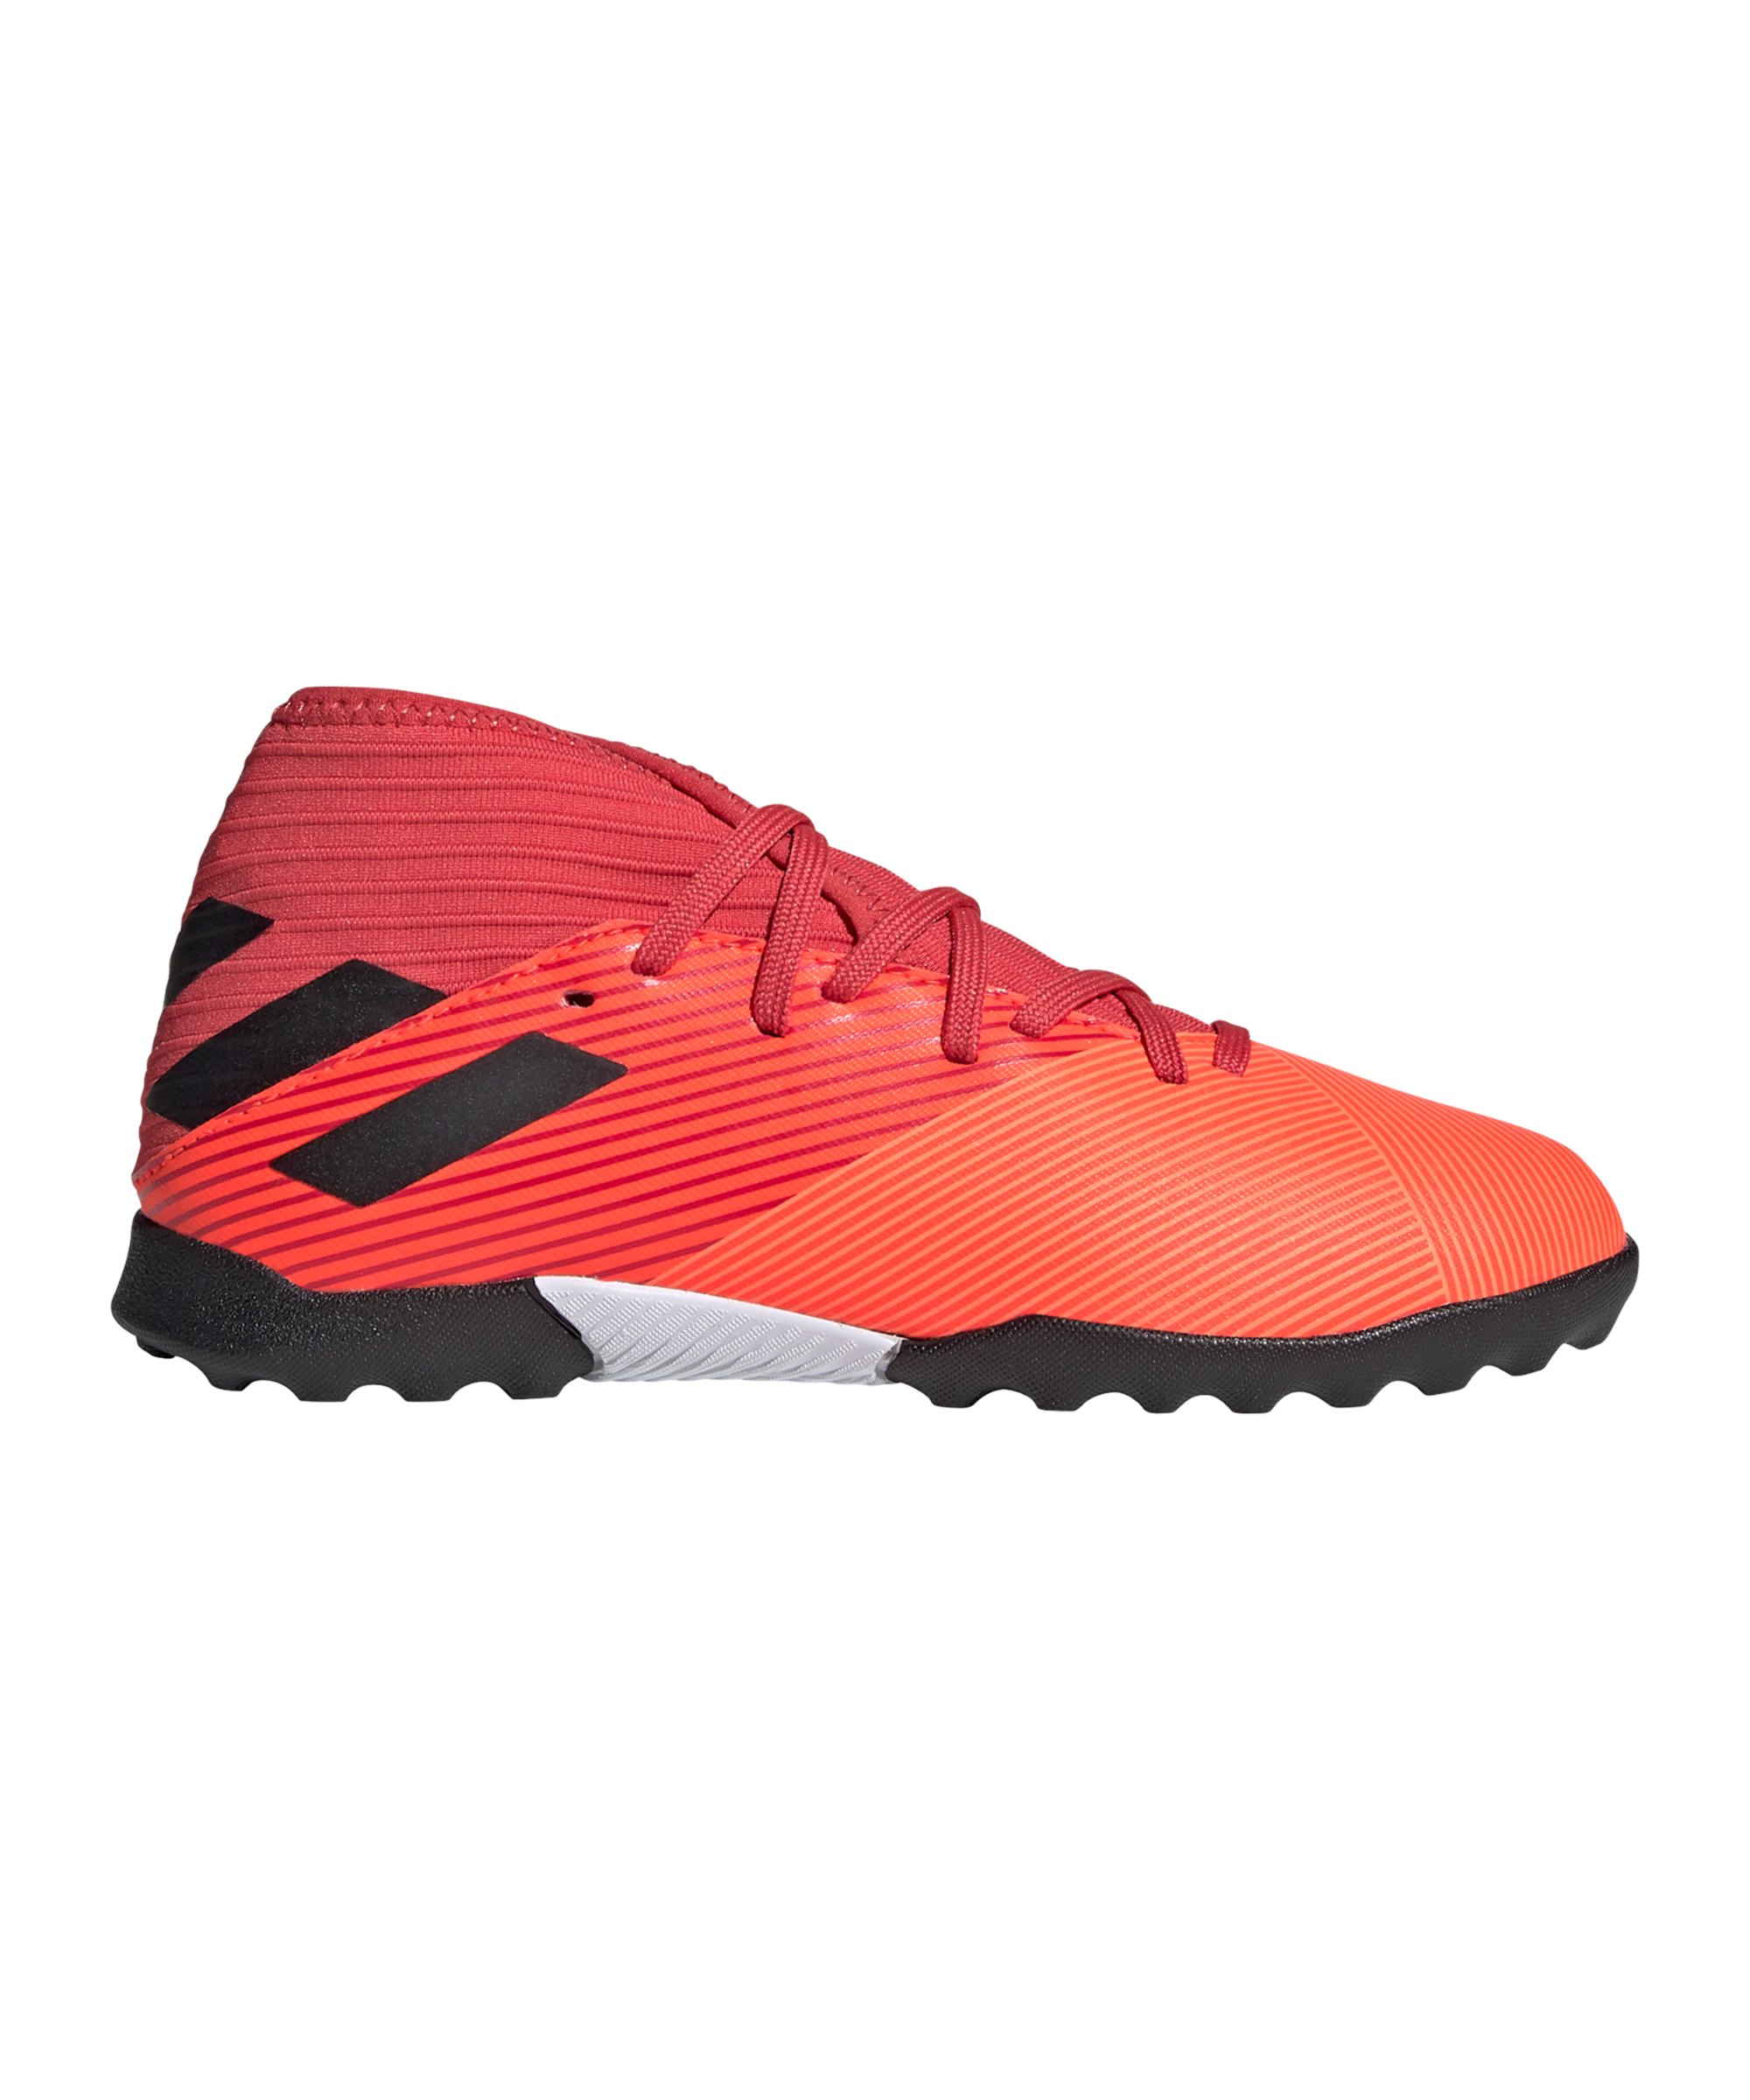 adidas NEMEZIZ Inflight 19.3 TF J Kids Orange - orange